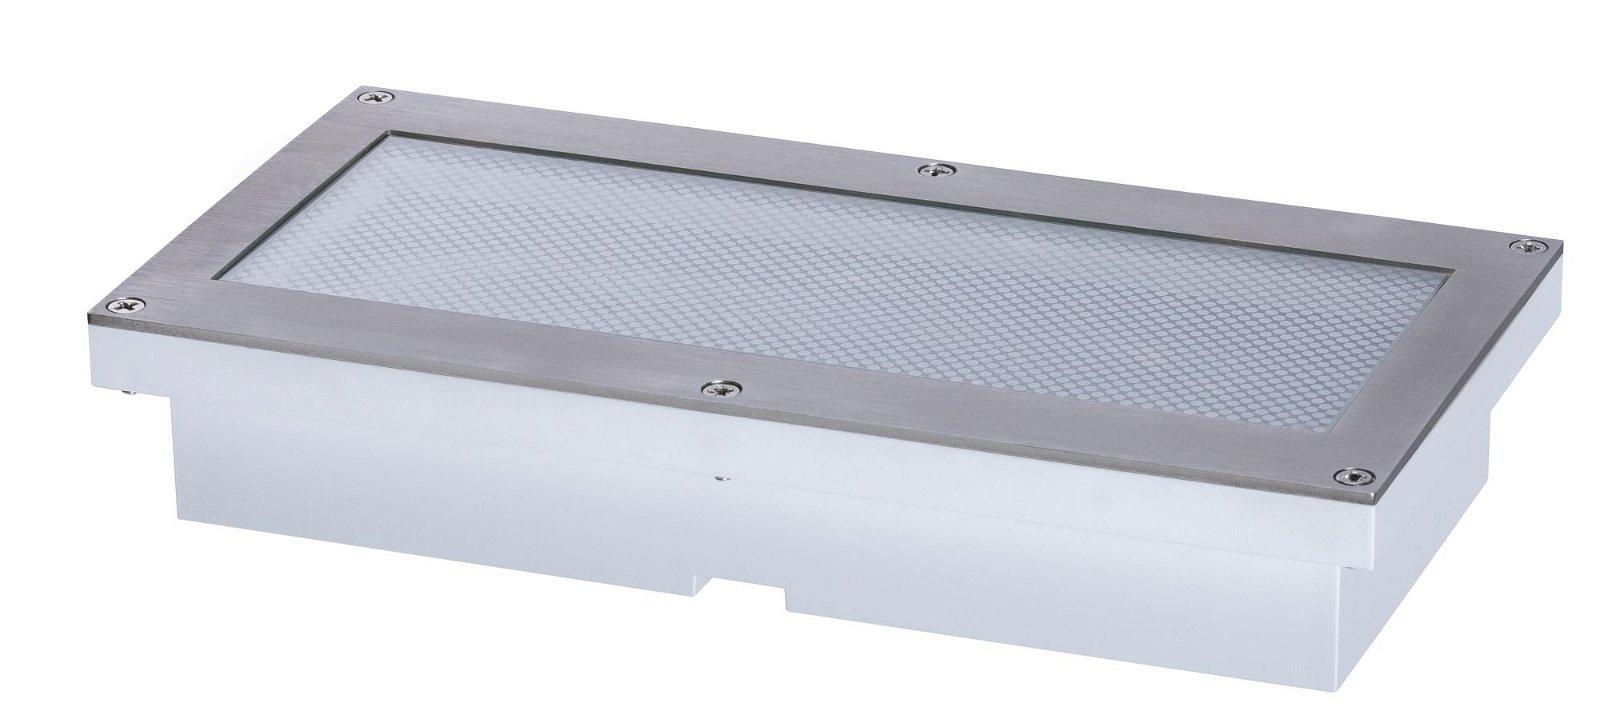 LED Bodeneinbauleuchte Brick Warmweiß IP67 200x100mm 3000K 1,6W 160lm 230V Alu/Grau Metall/Edelstahl